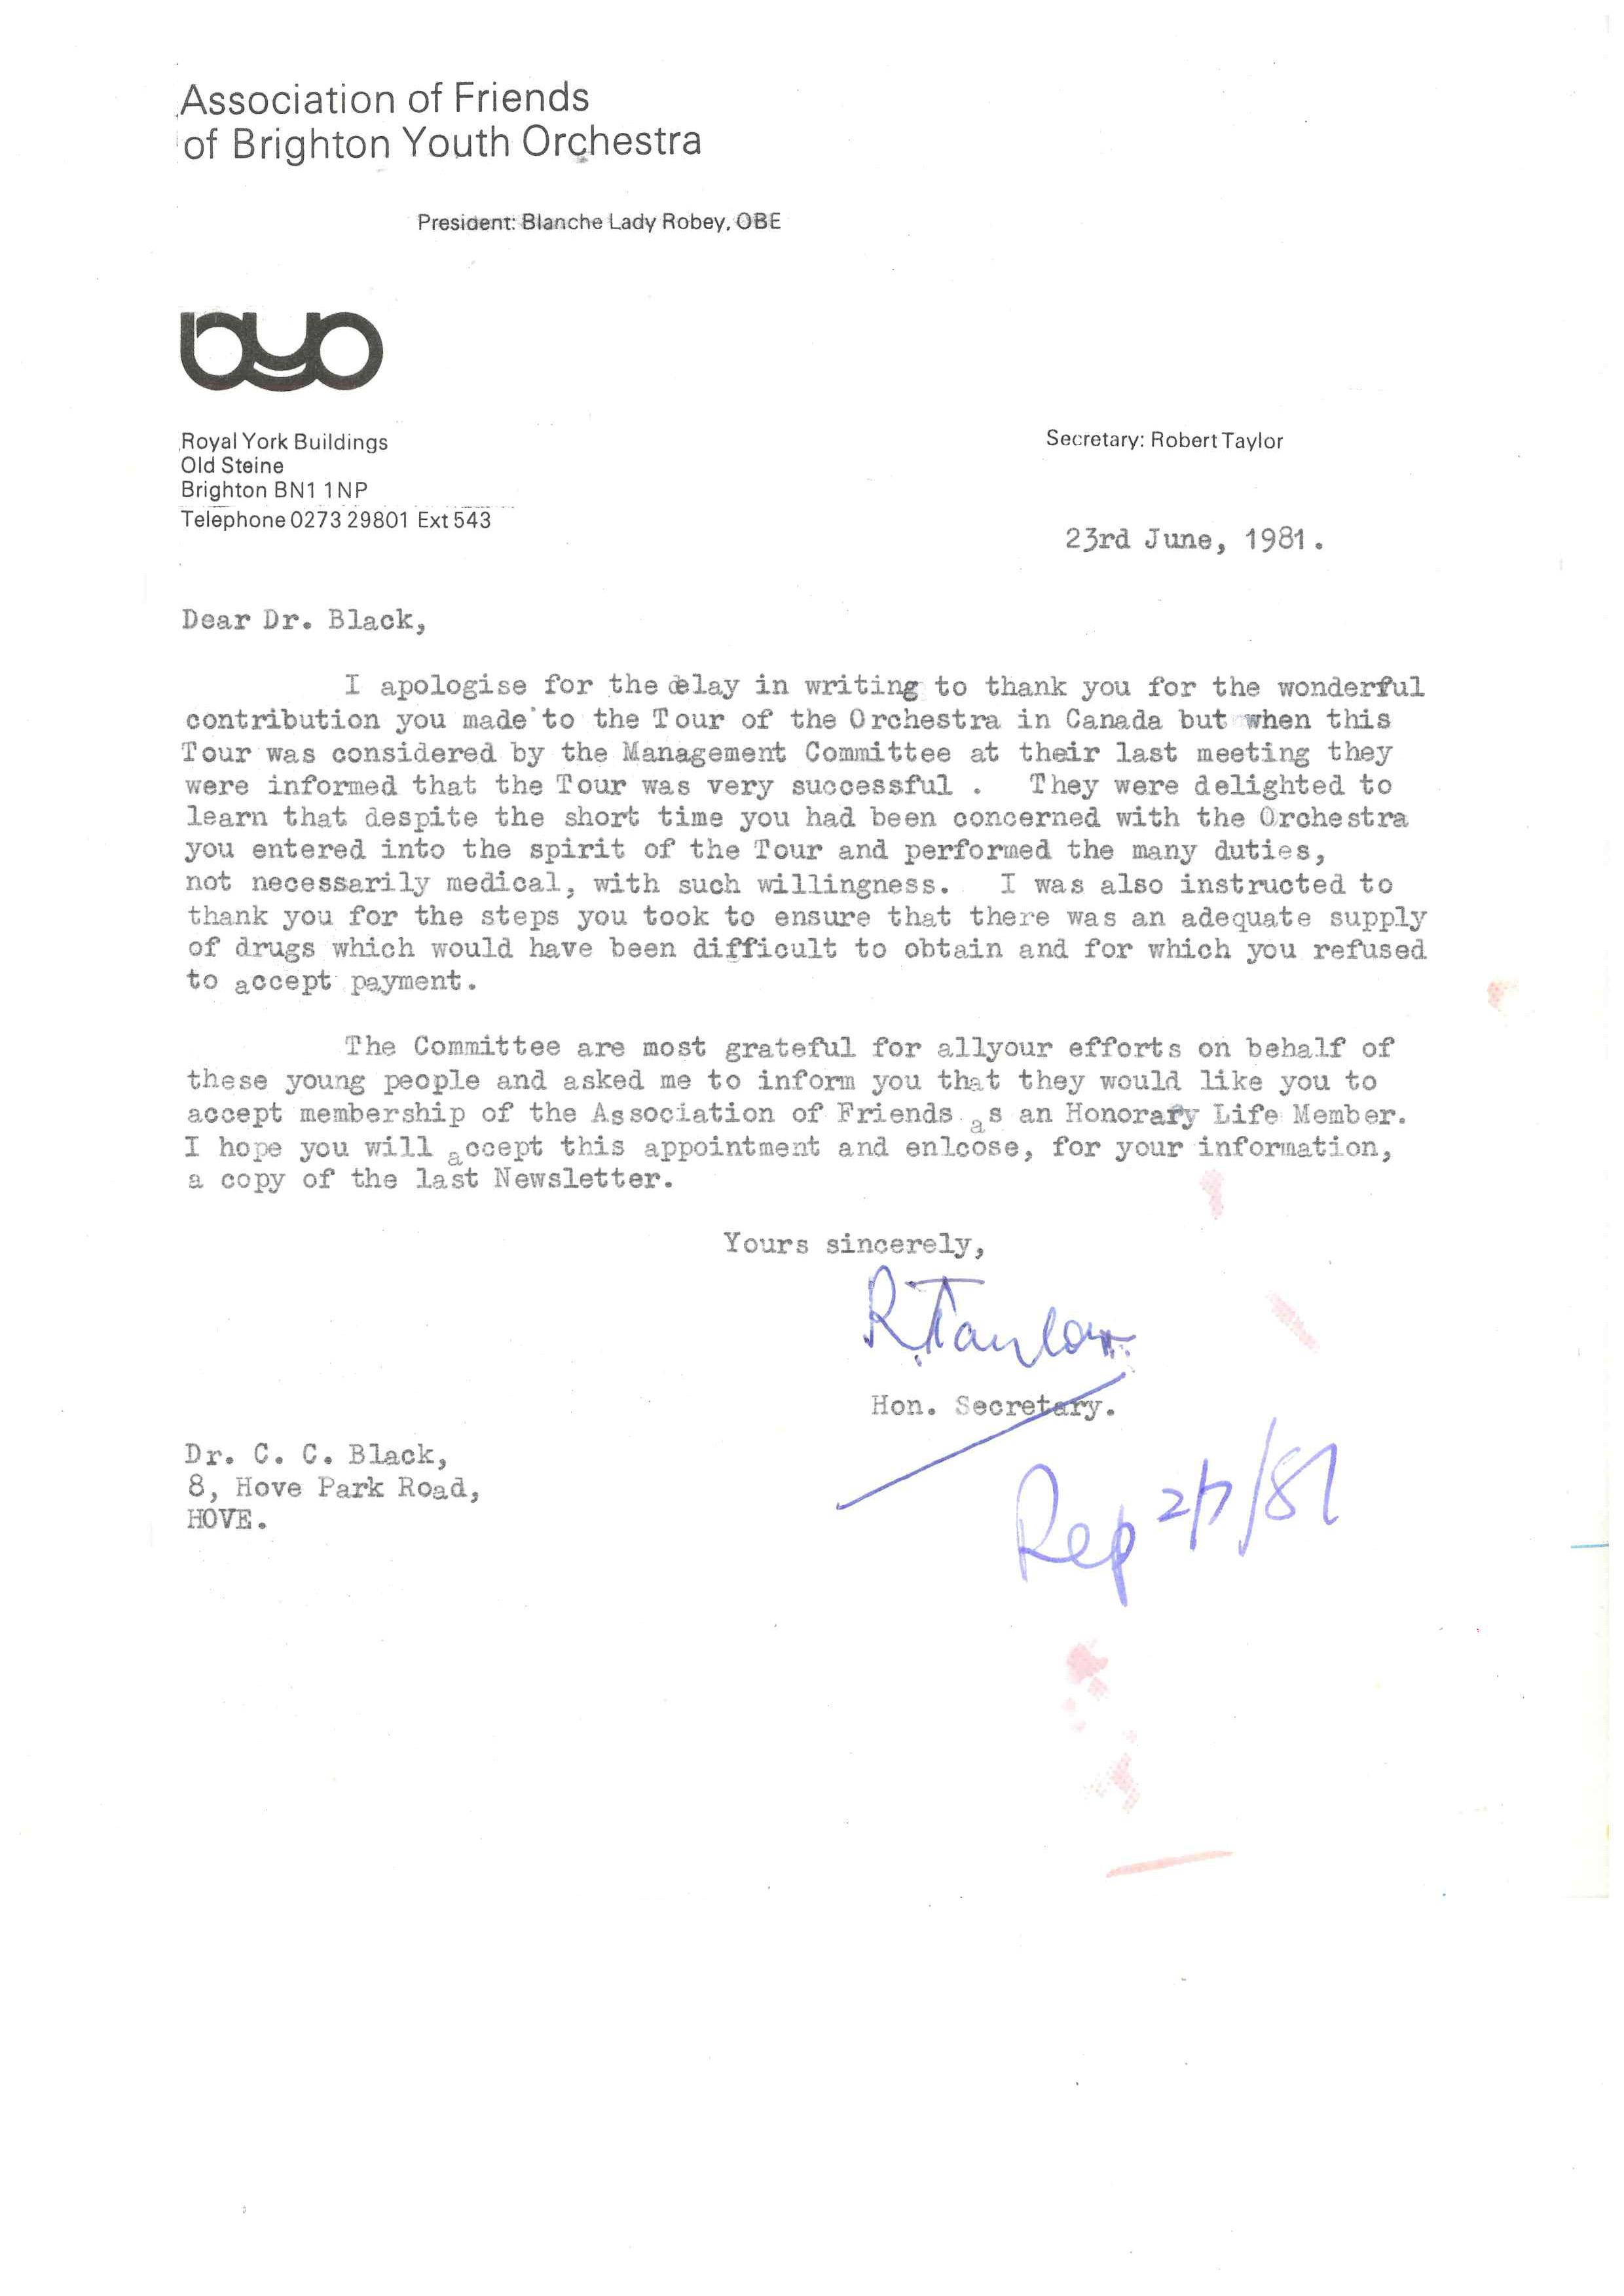 00126-BYO Letter; Robert Taylor to C. Black, 23rd June 1981.jpg